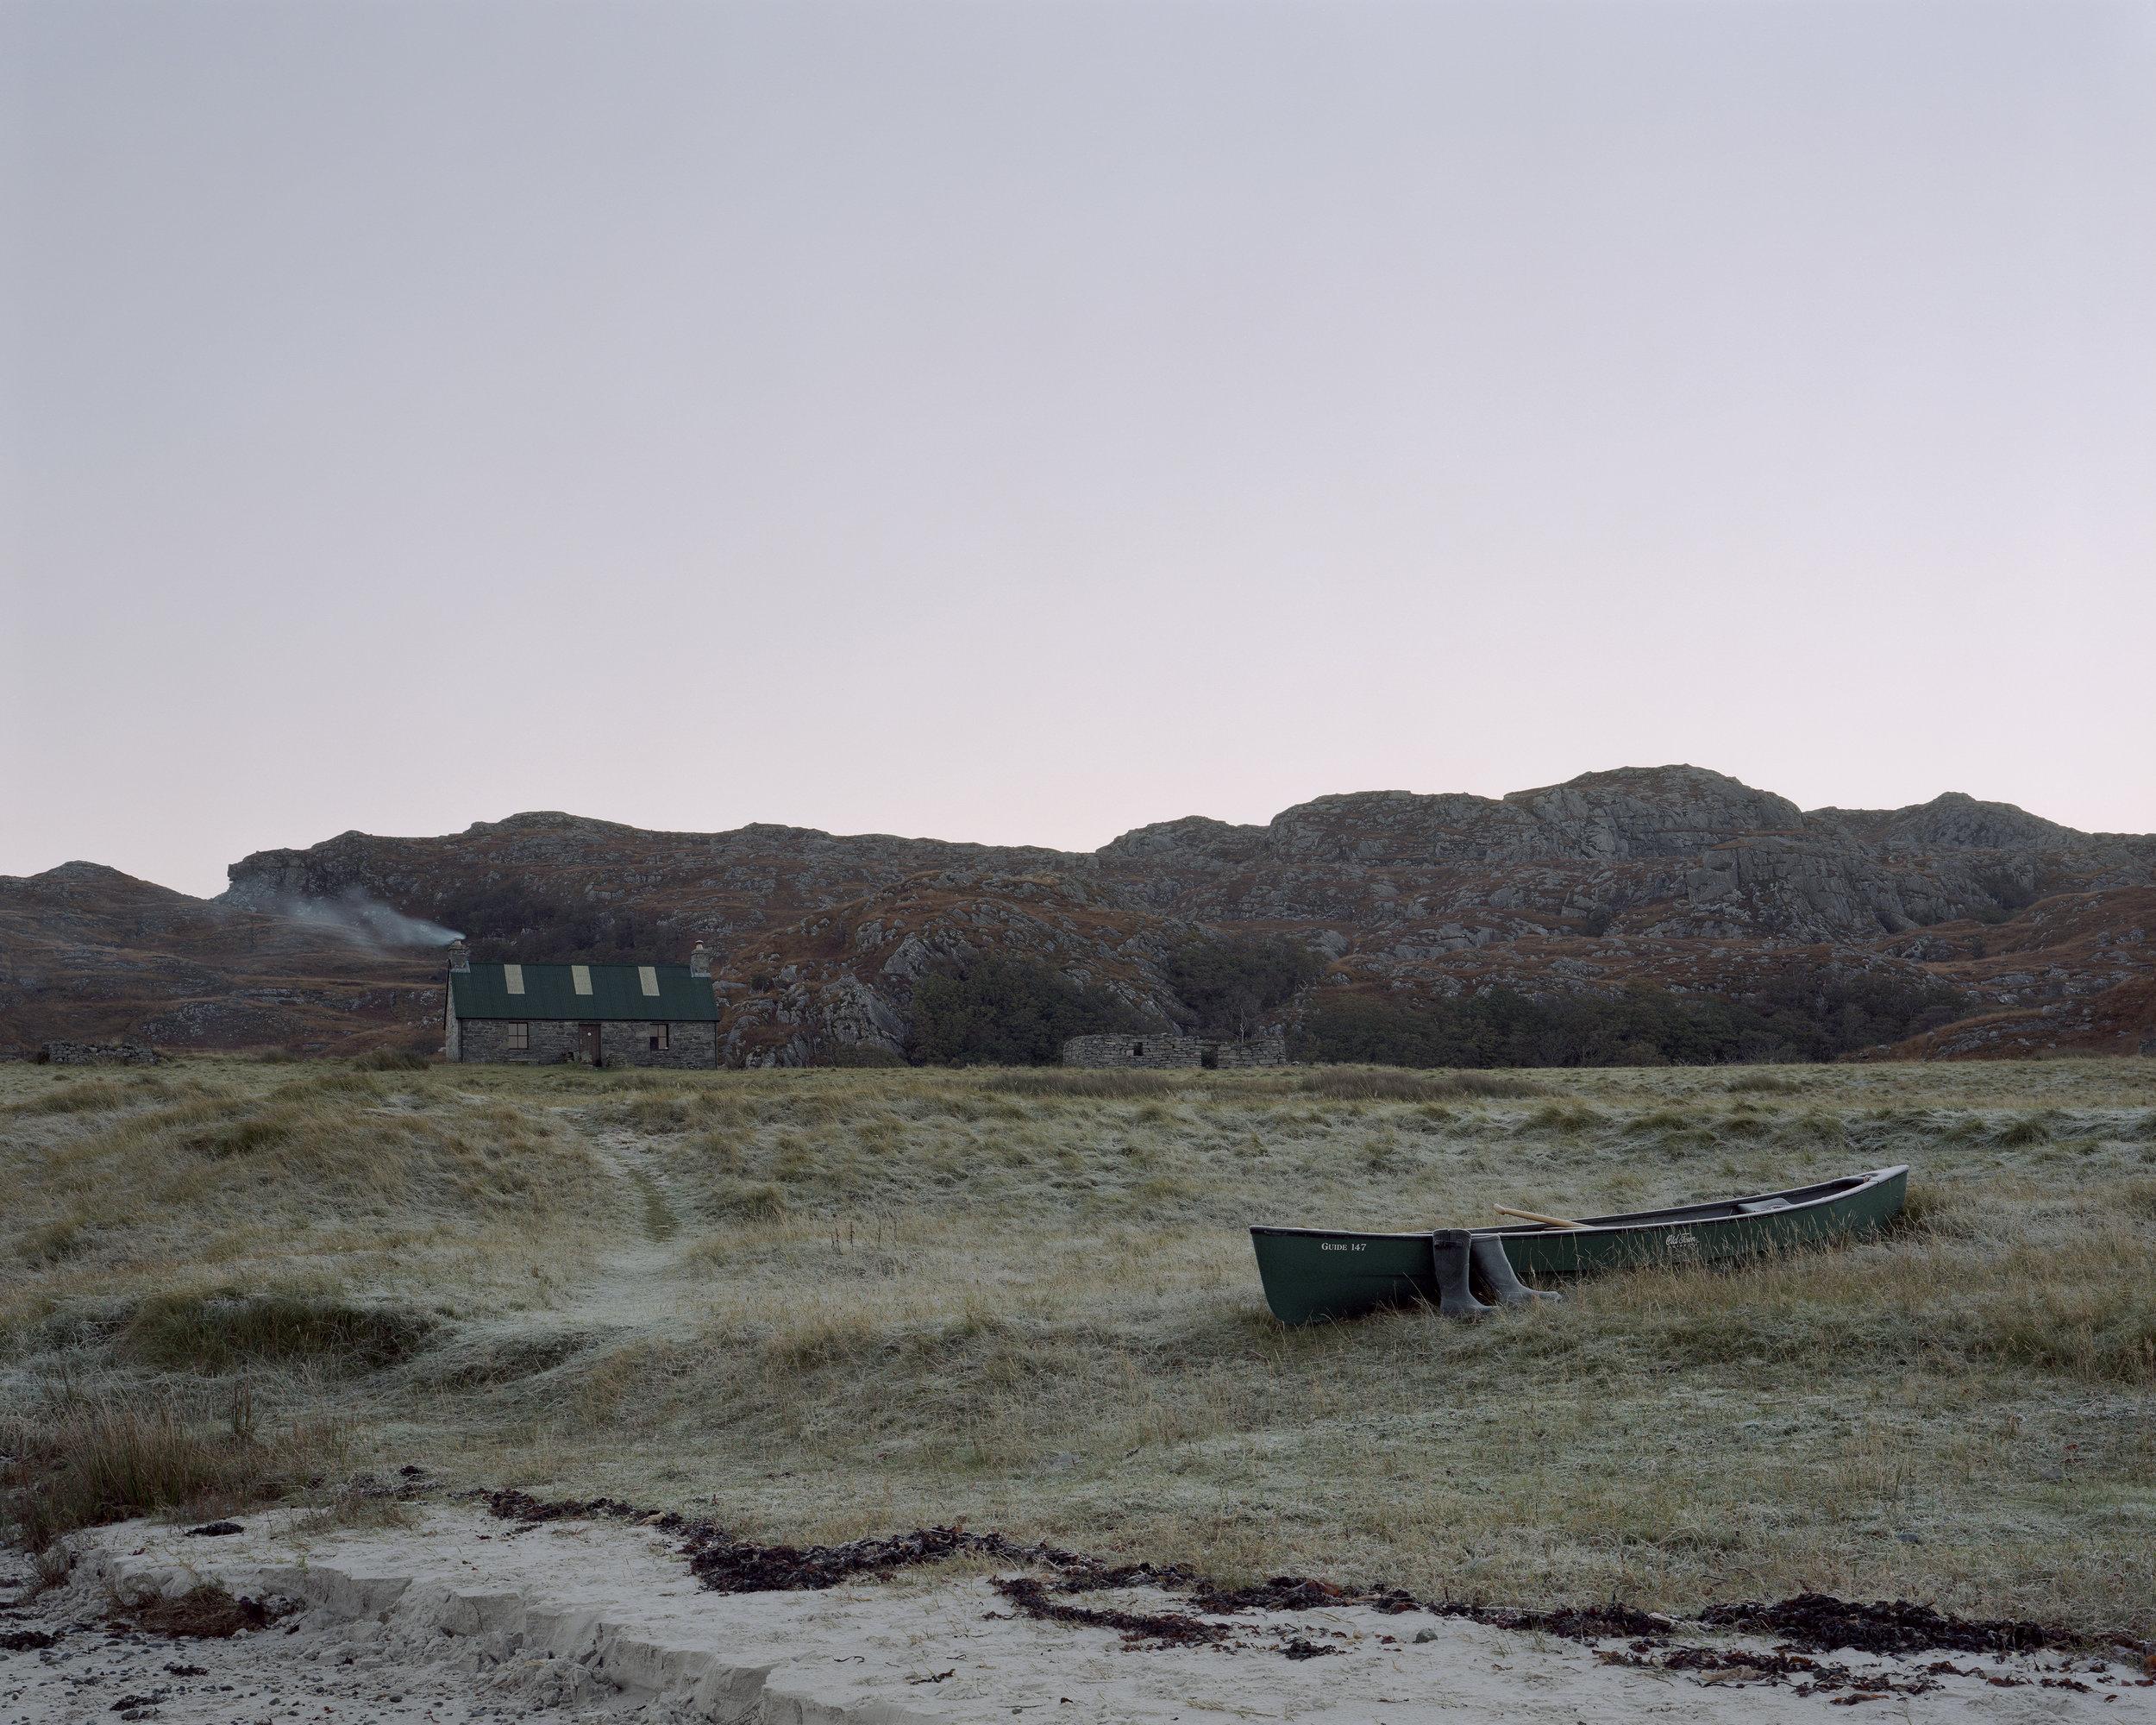 Sandy's Canoe at Peanmeanach, Ardnish, Peninsula, Scotland